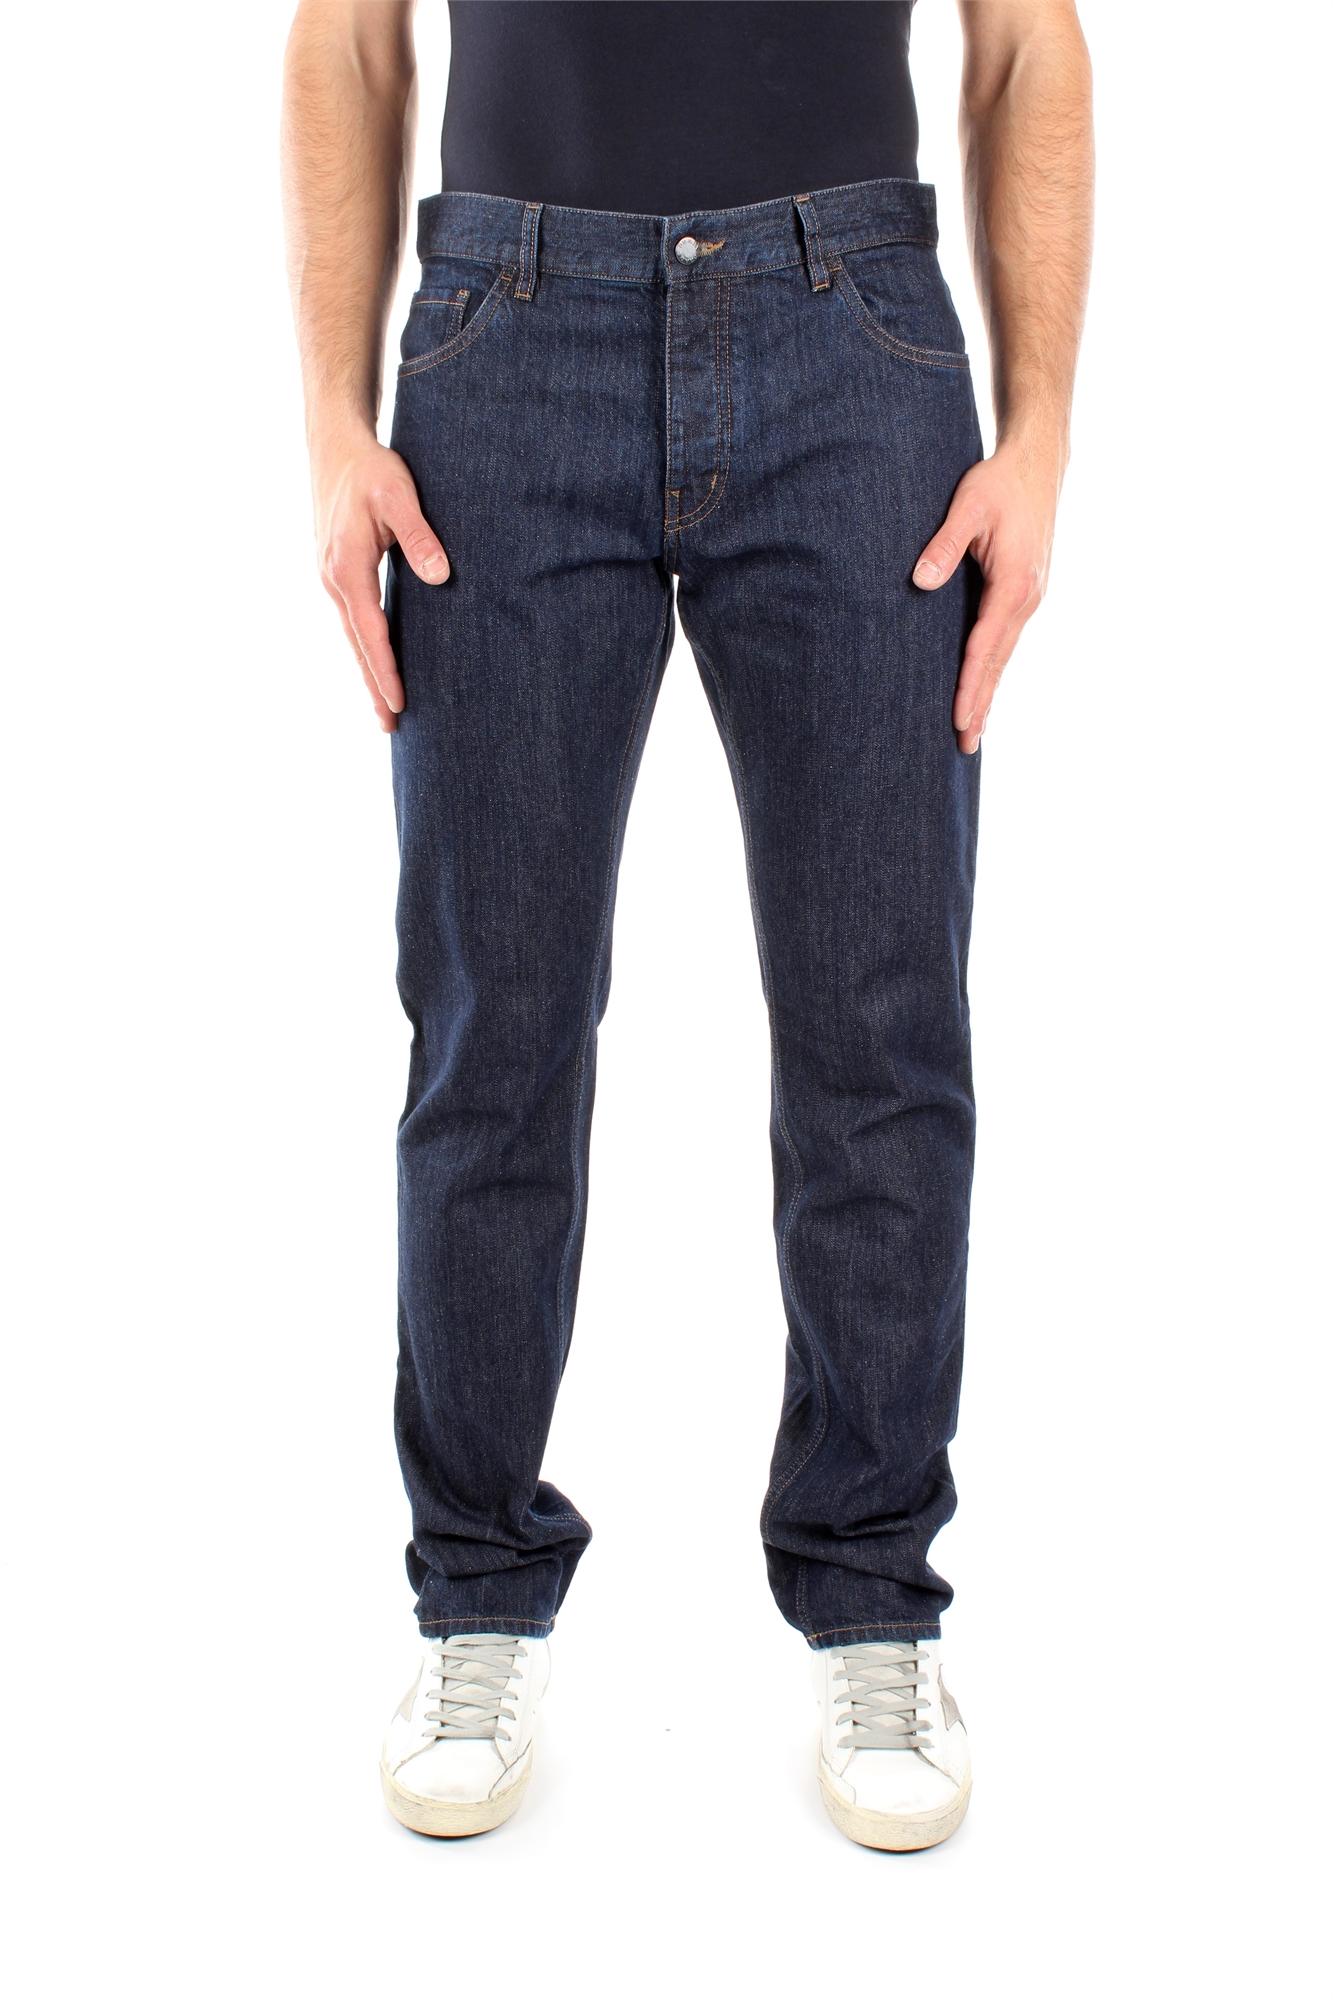 Jeans-Prada-tight-fit-Uomo-GEP110BLEULIGHT